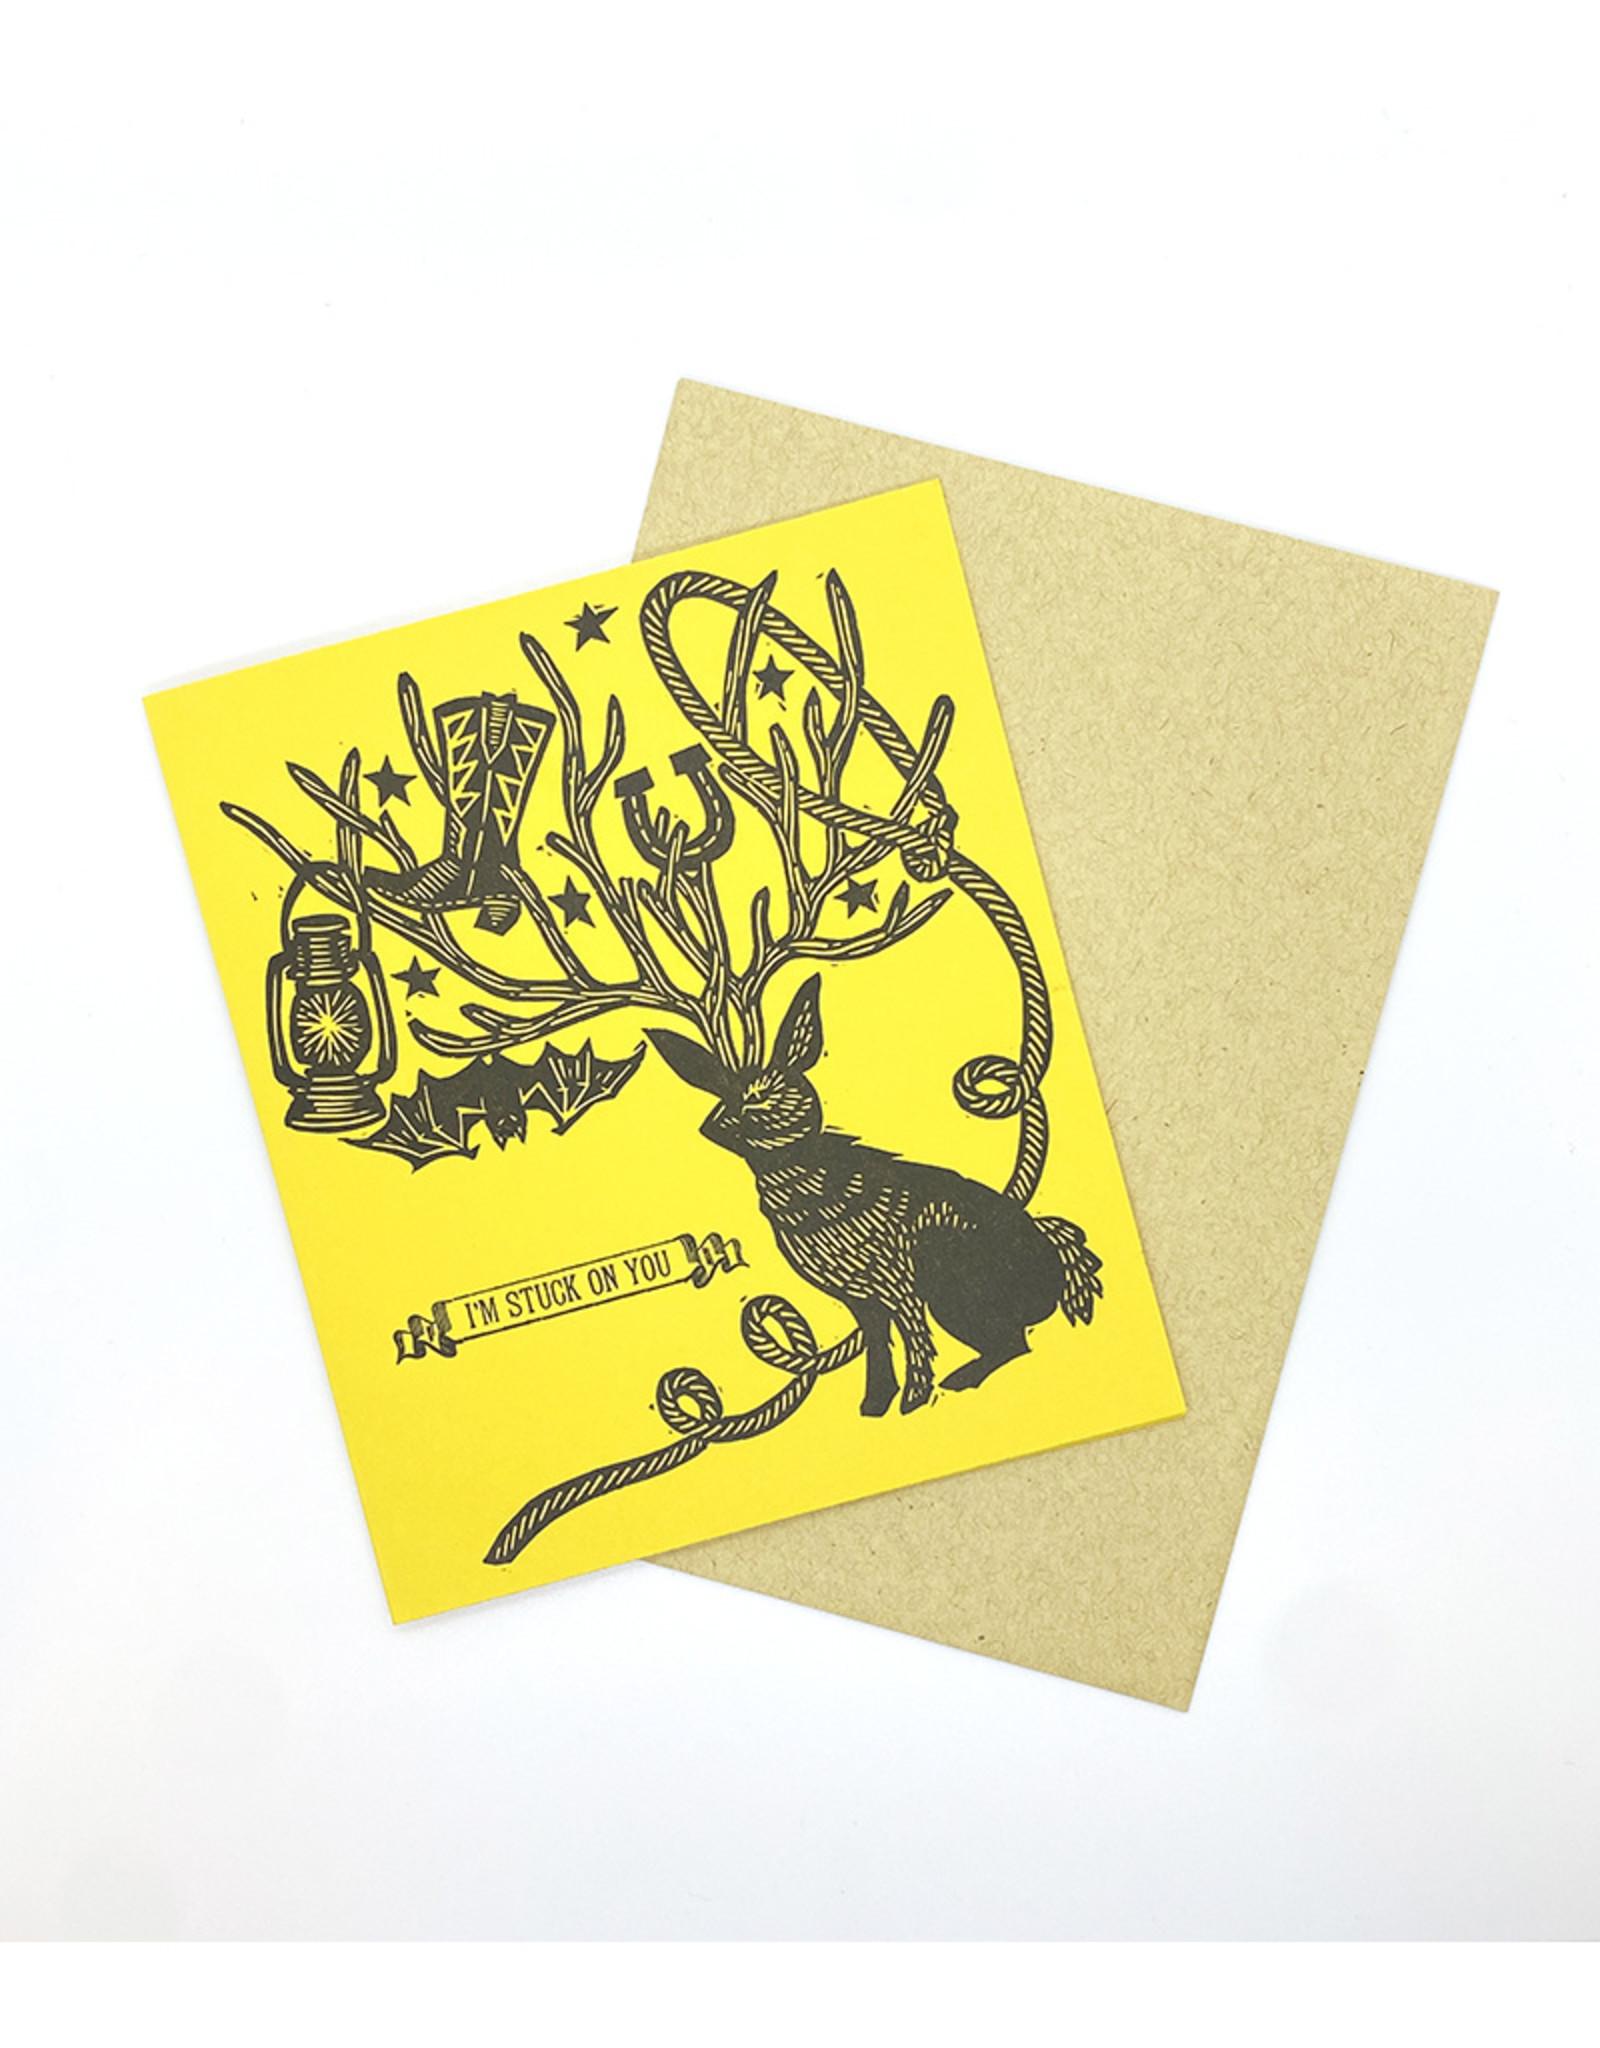 Anne Luben Stuck On You Letterpress Greeting Cards by Anne Luben